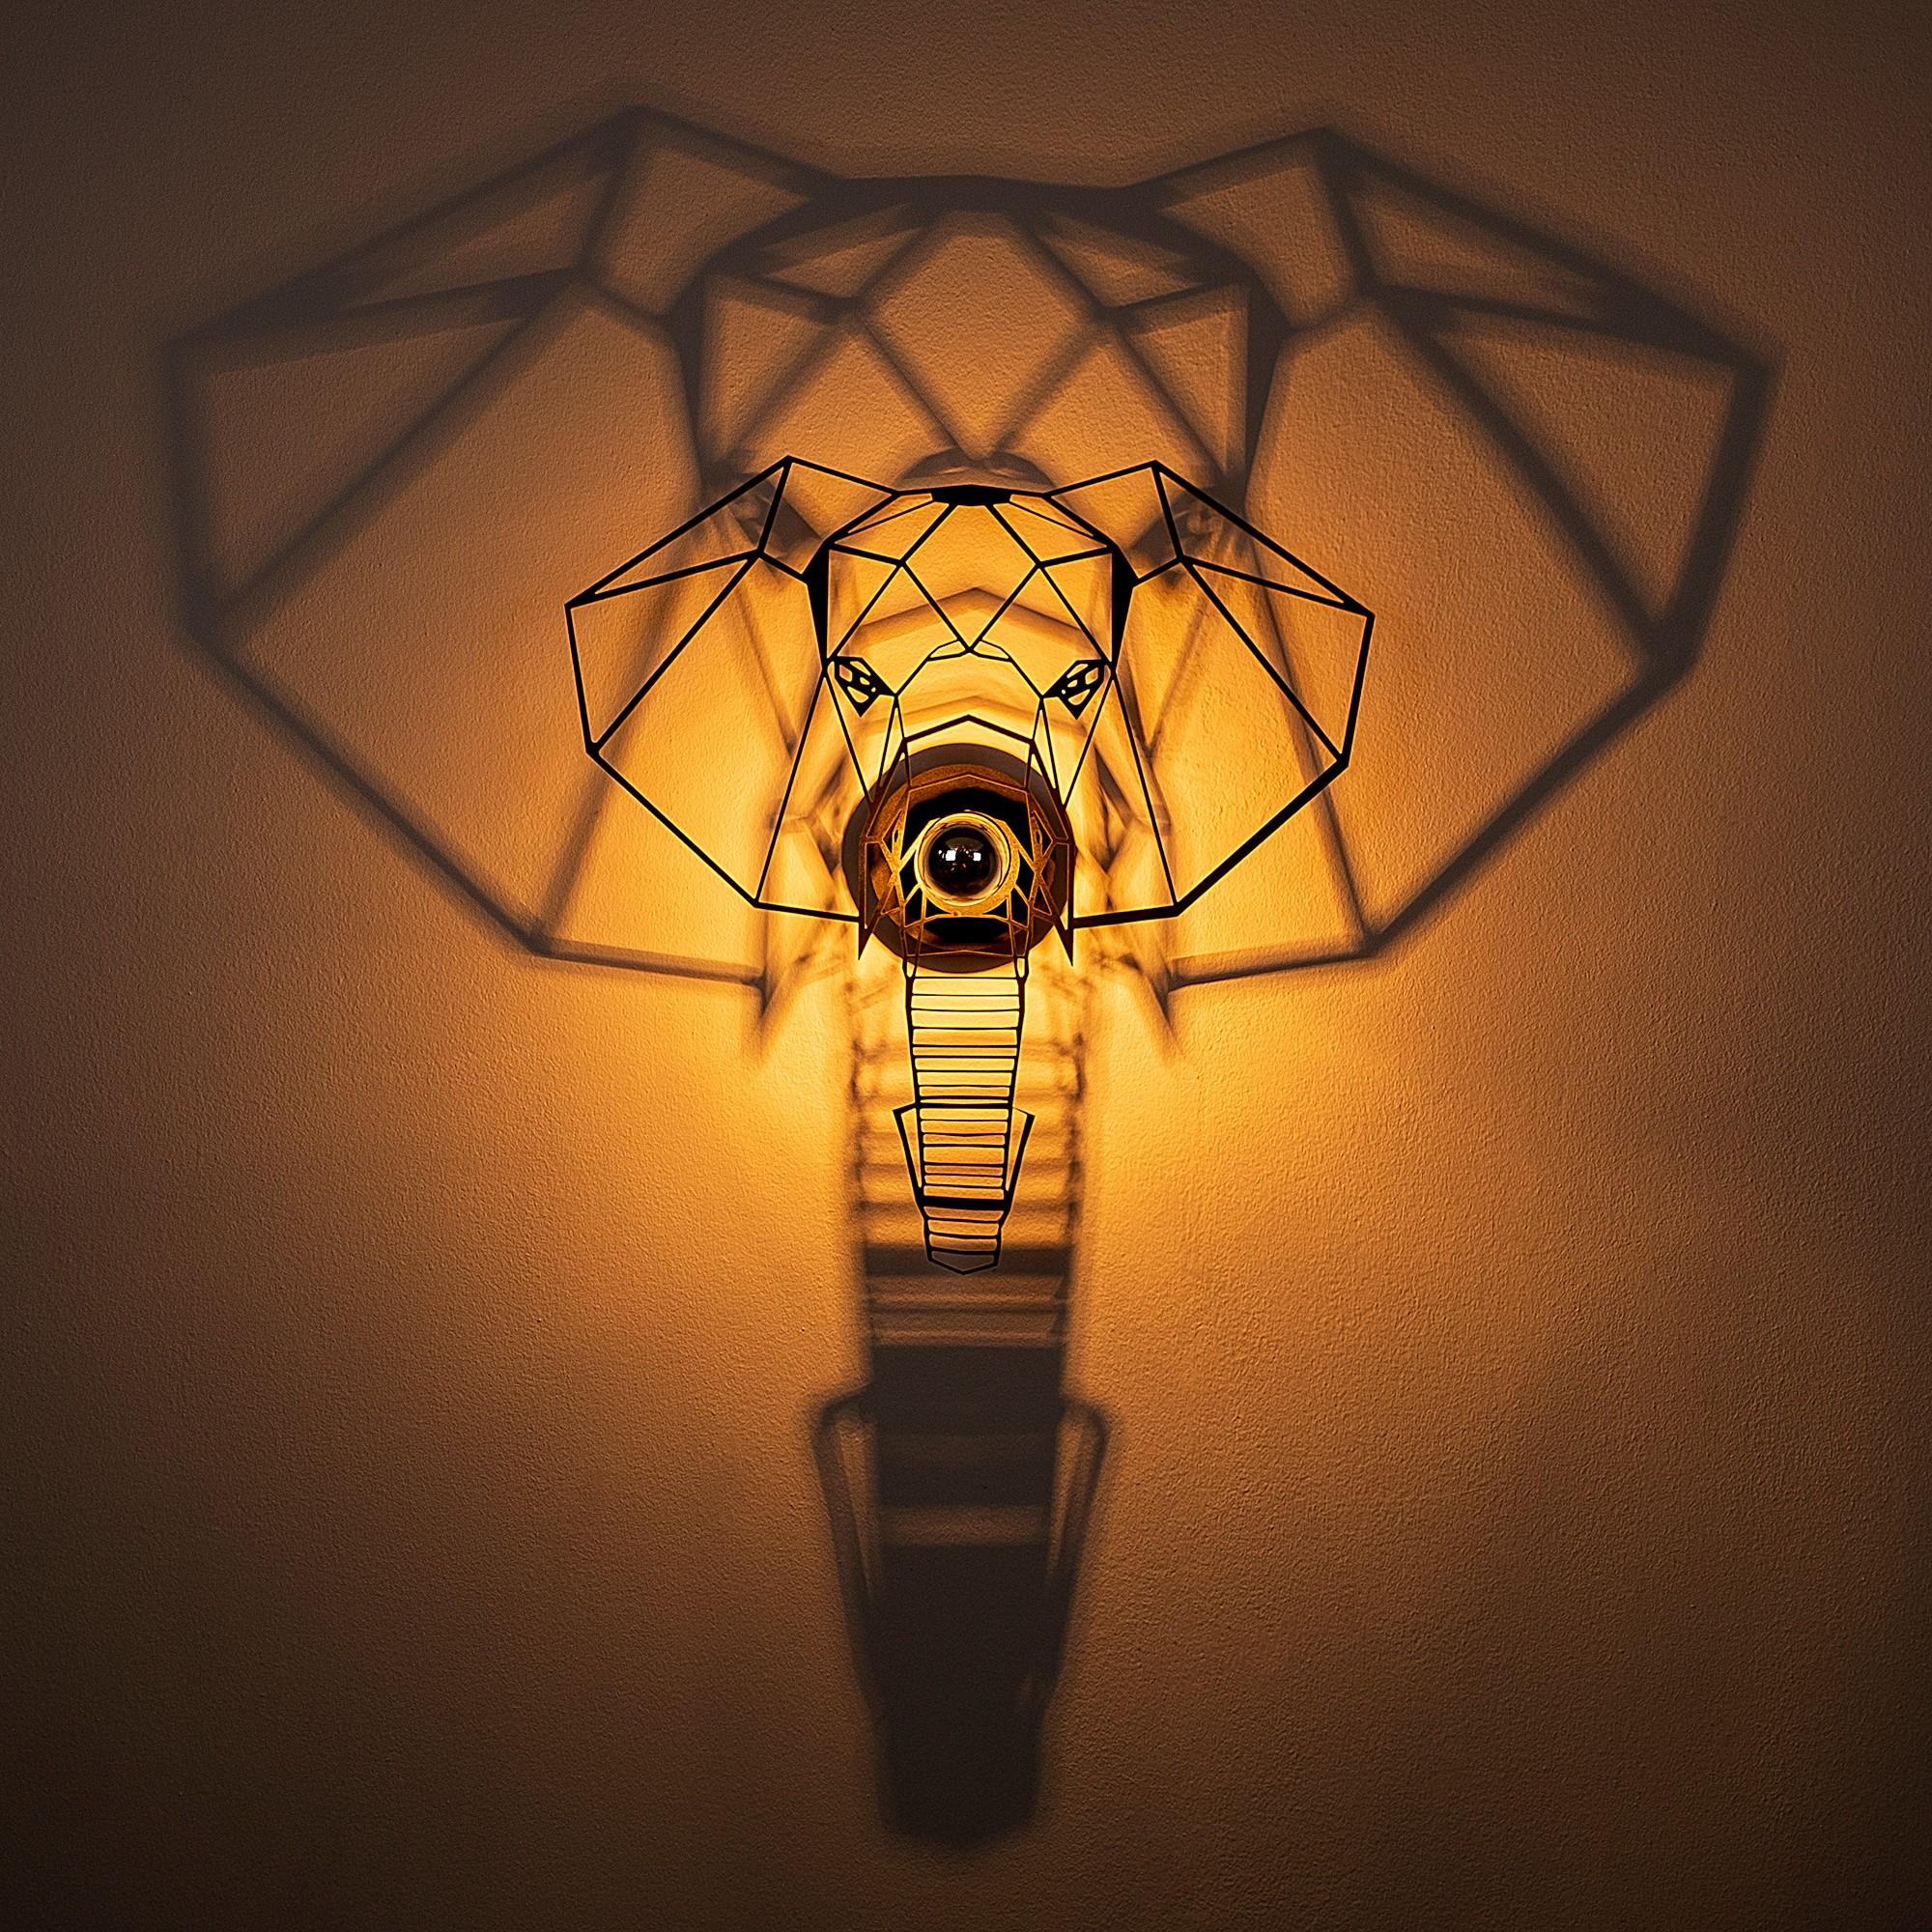 LED industriële wanddeco lamp dieren - Olifant - dimbaar - E27 fitting - Incl lamp aan